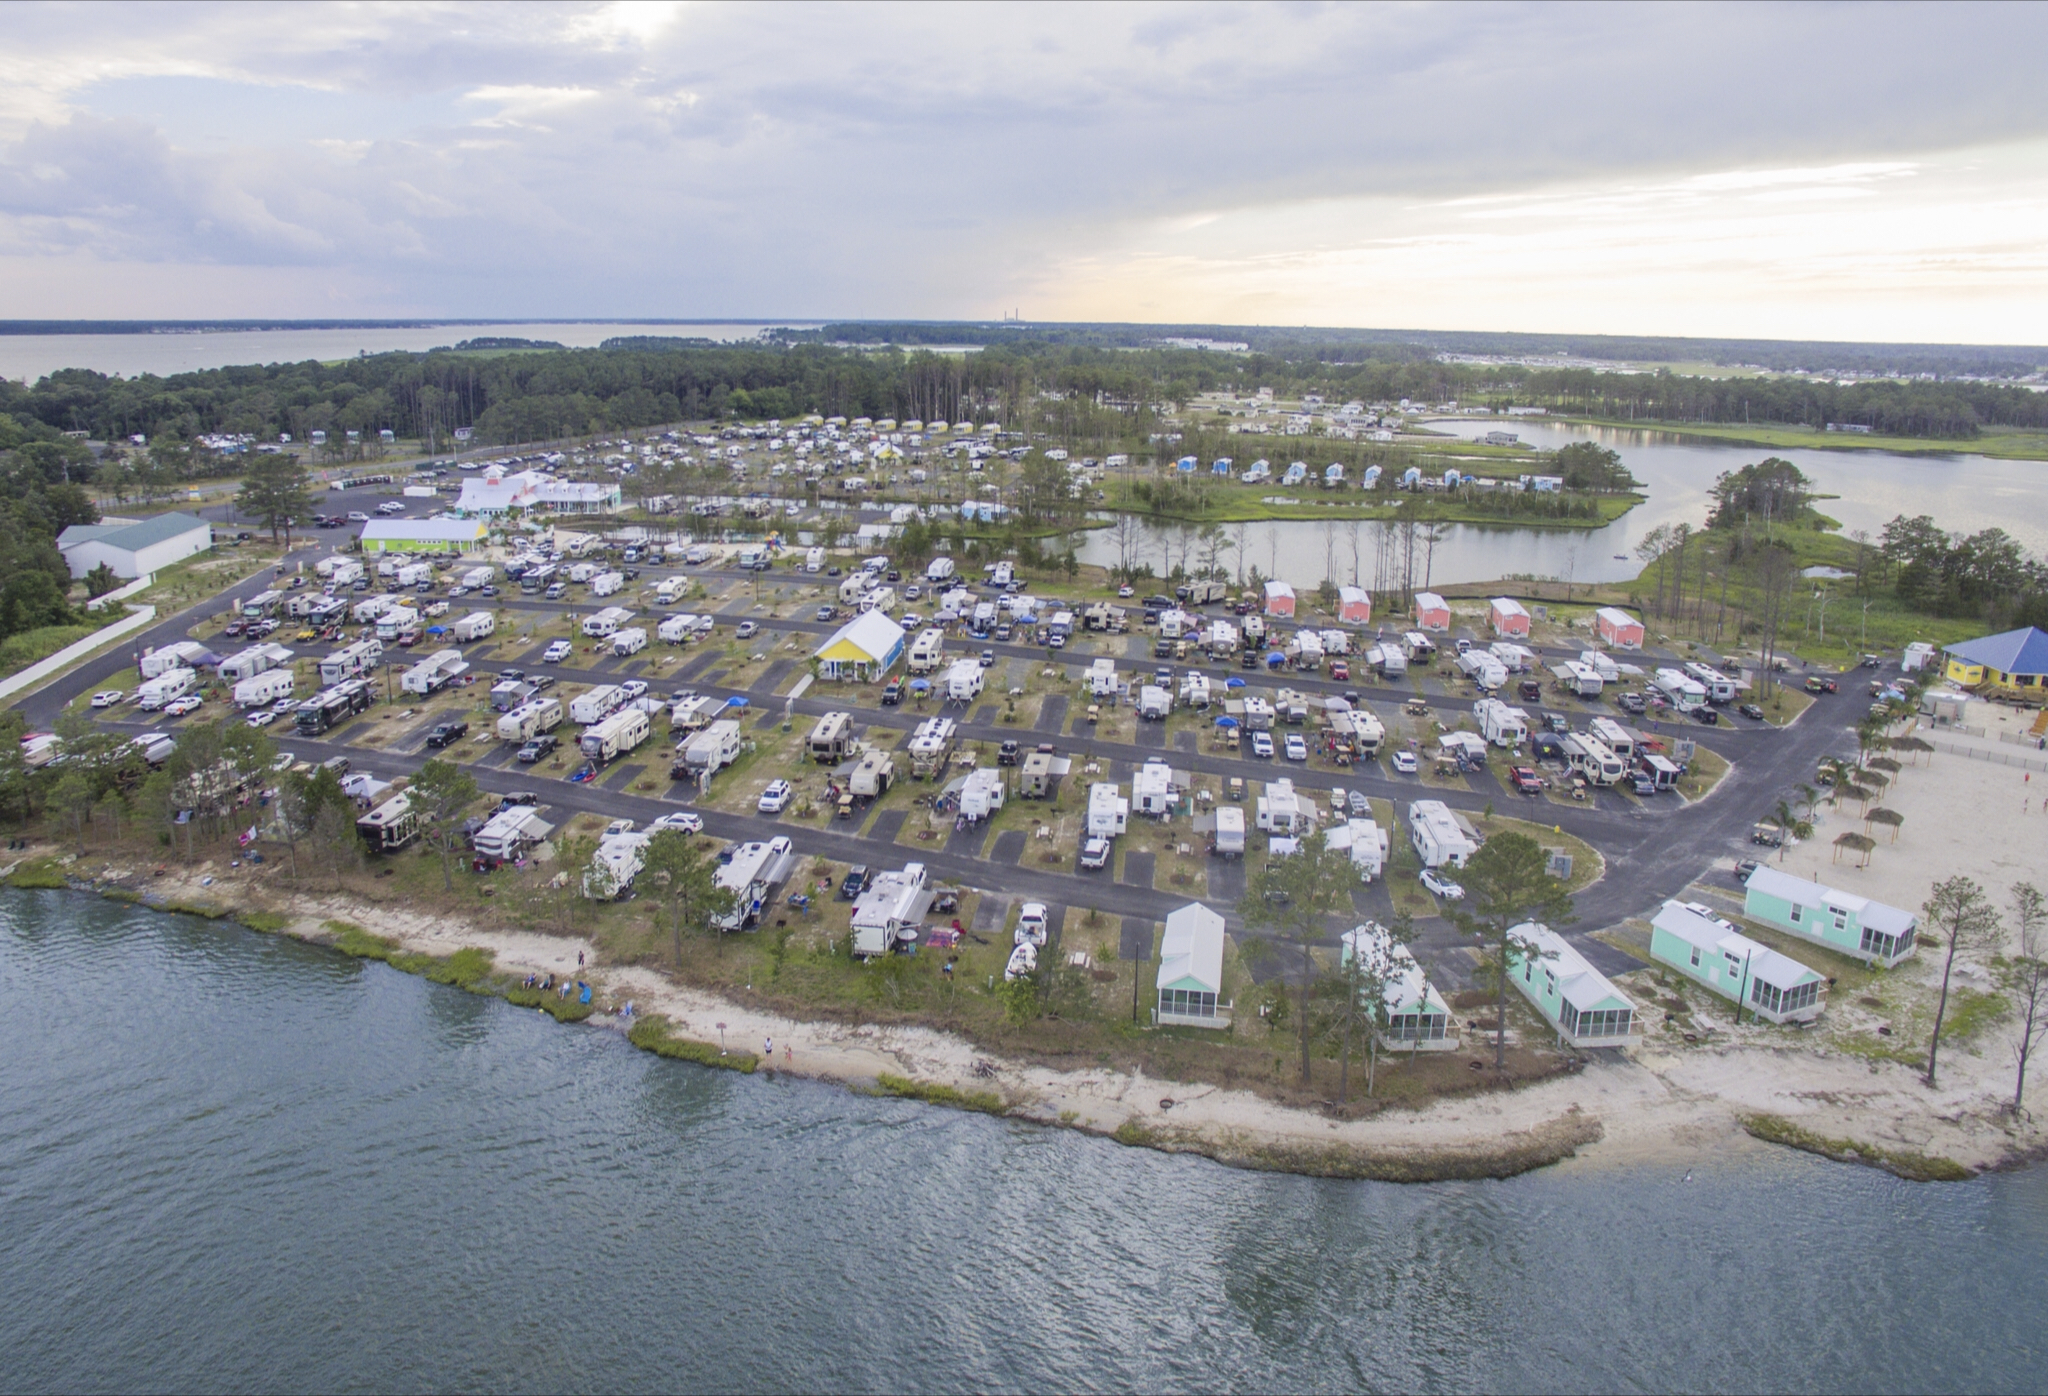 Aerial shot of beachside RV park.